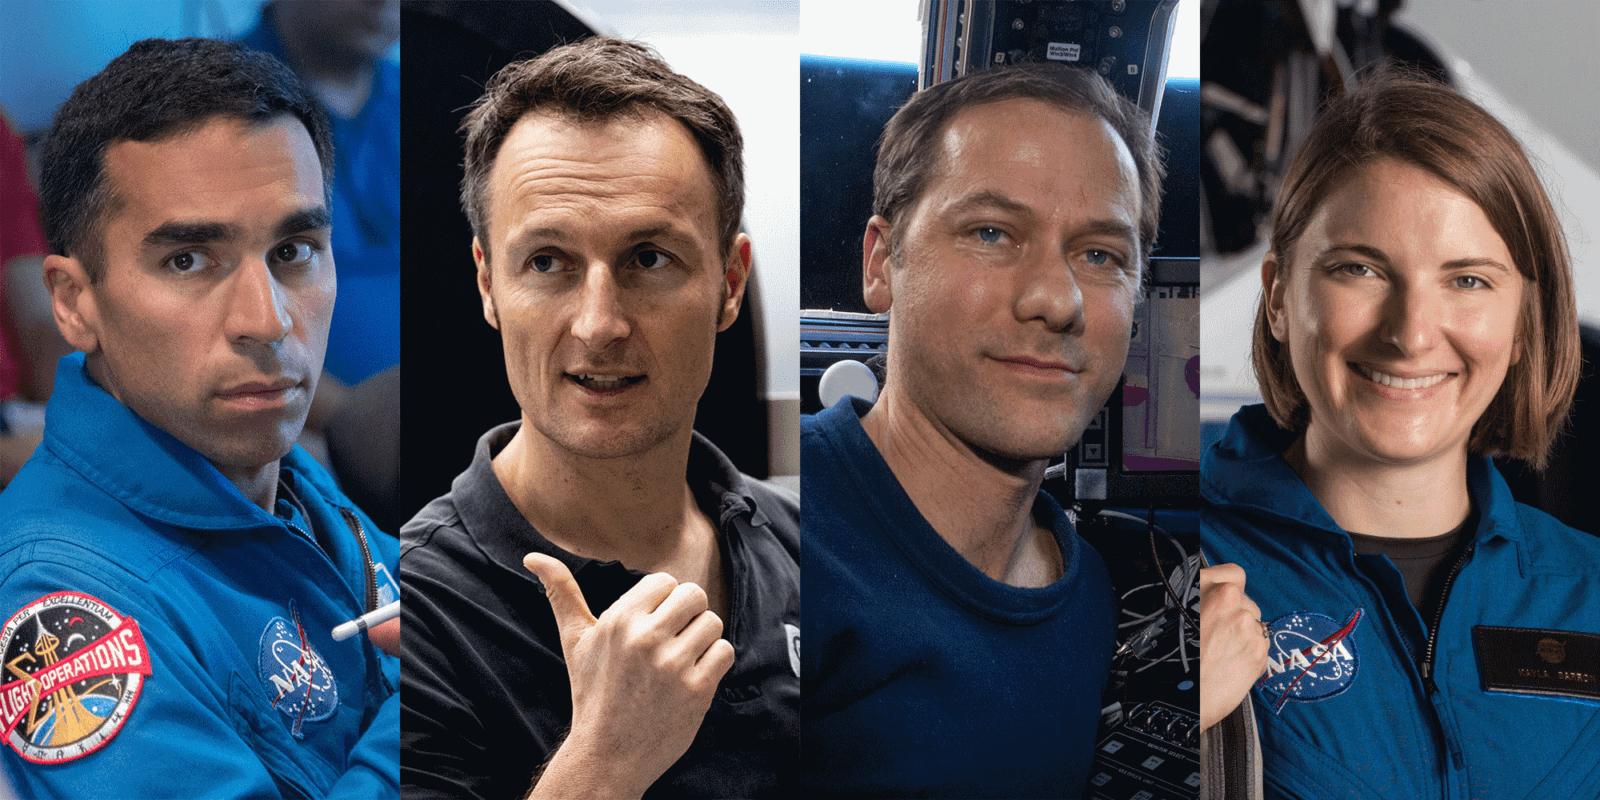 NASA сообщила дату следующего запуска астронавтов SpaceX (SpaceX Crew 3 members)